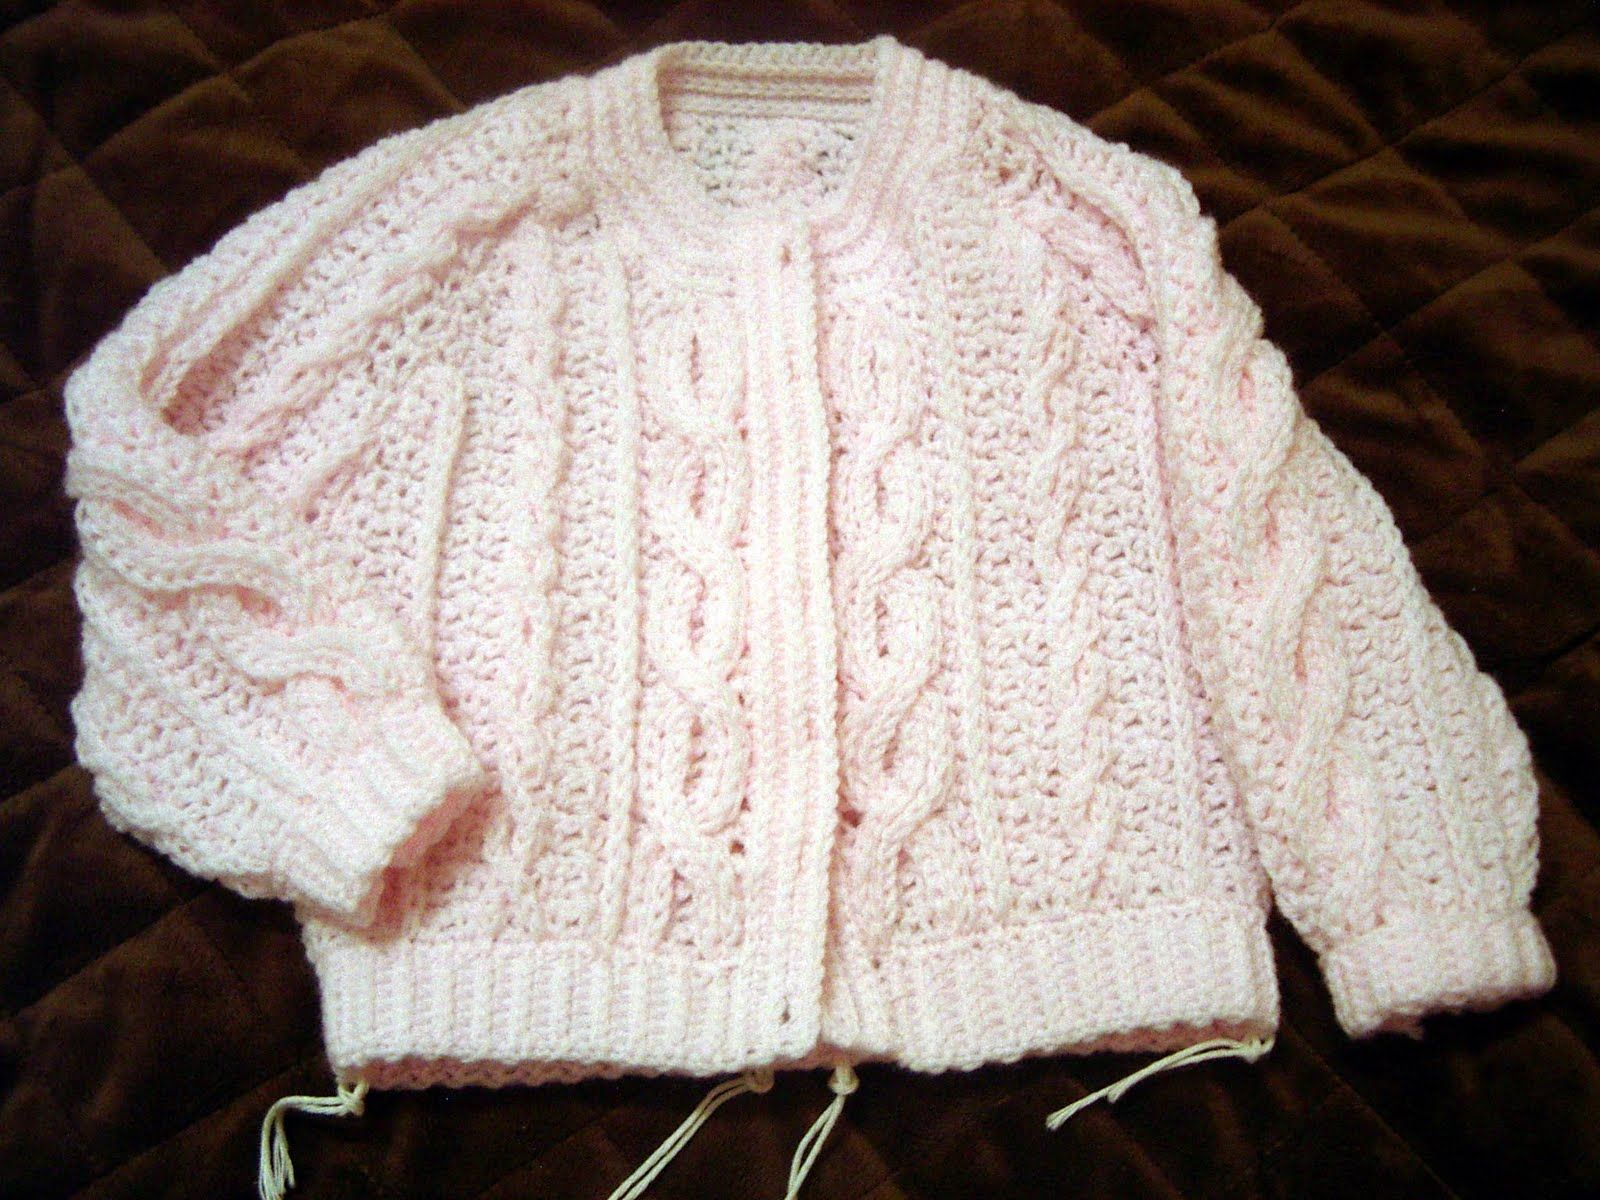 Aran Crochet Joyce S Way Aran Crochet Done The Joyce D Jones Way Sweater Crochet Pattern Crochet Cable Stitch Crochet Baby Jacket